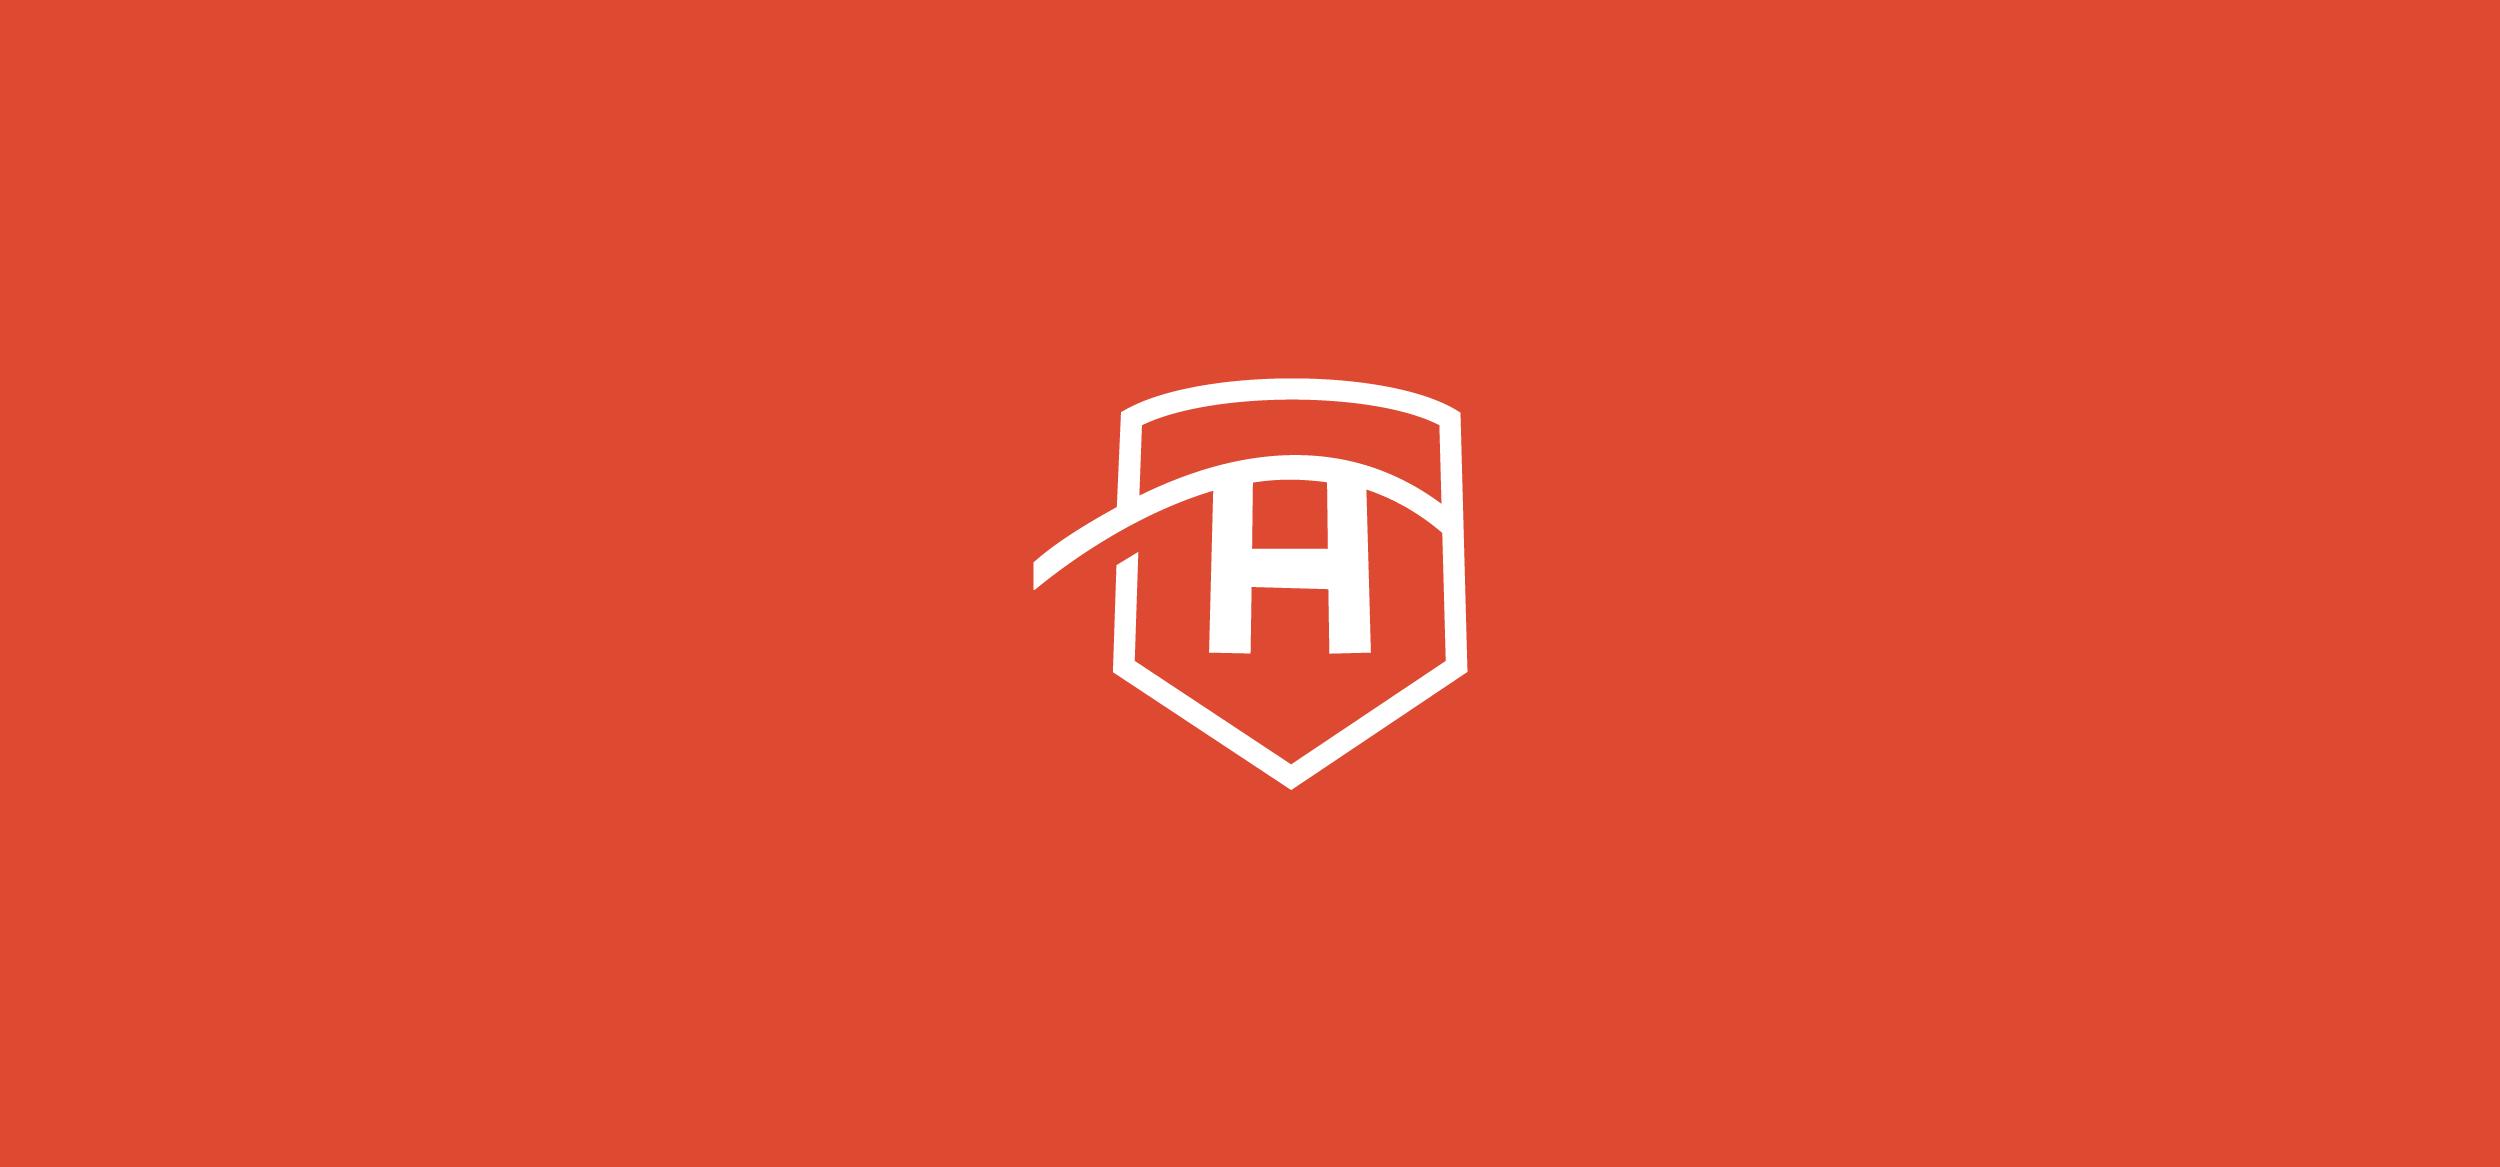 Hanger-30-logo.png